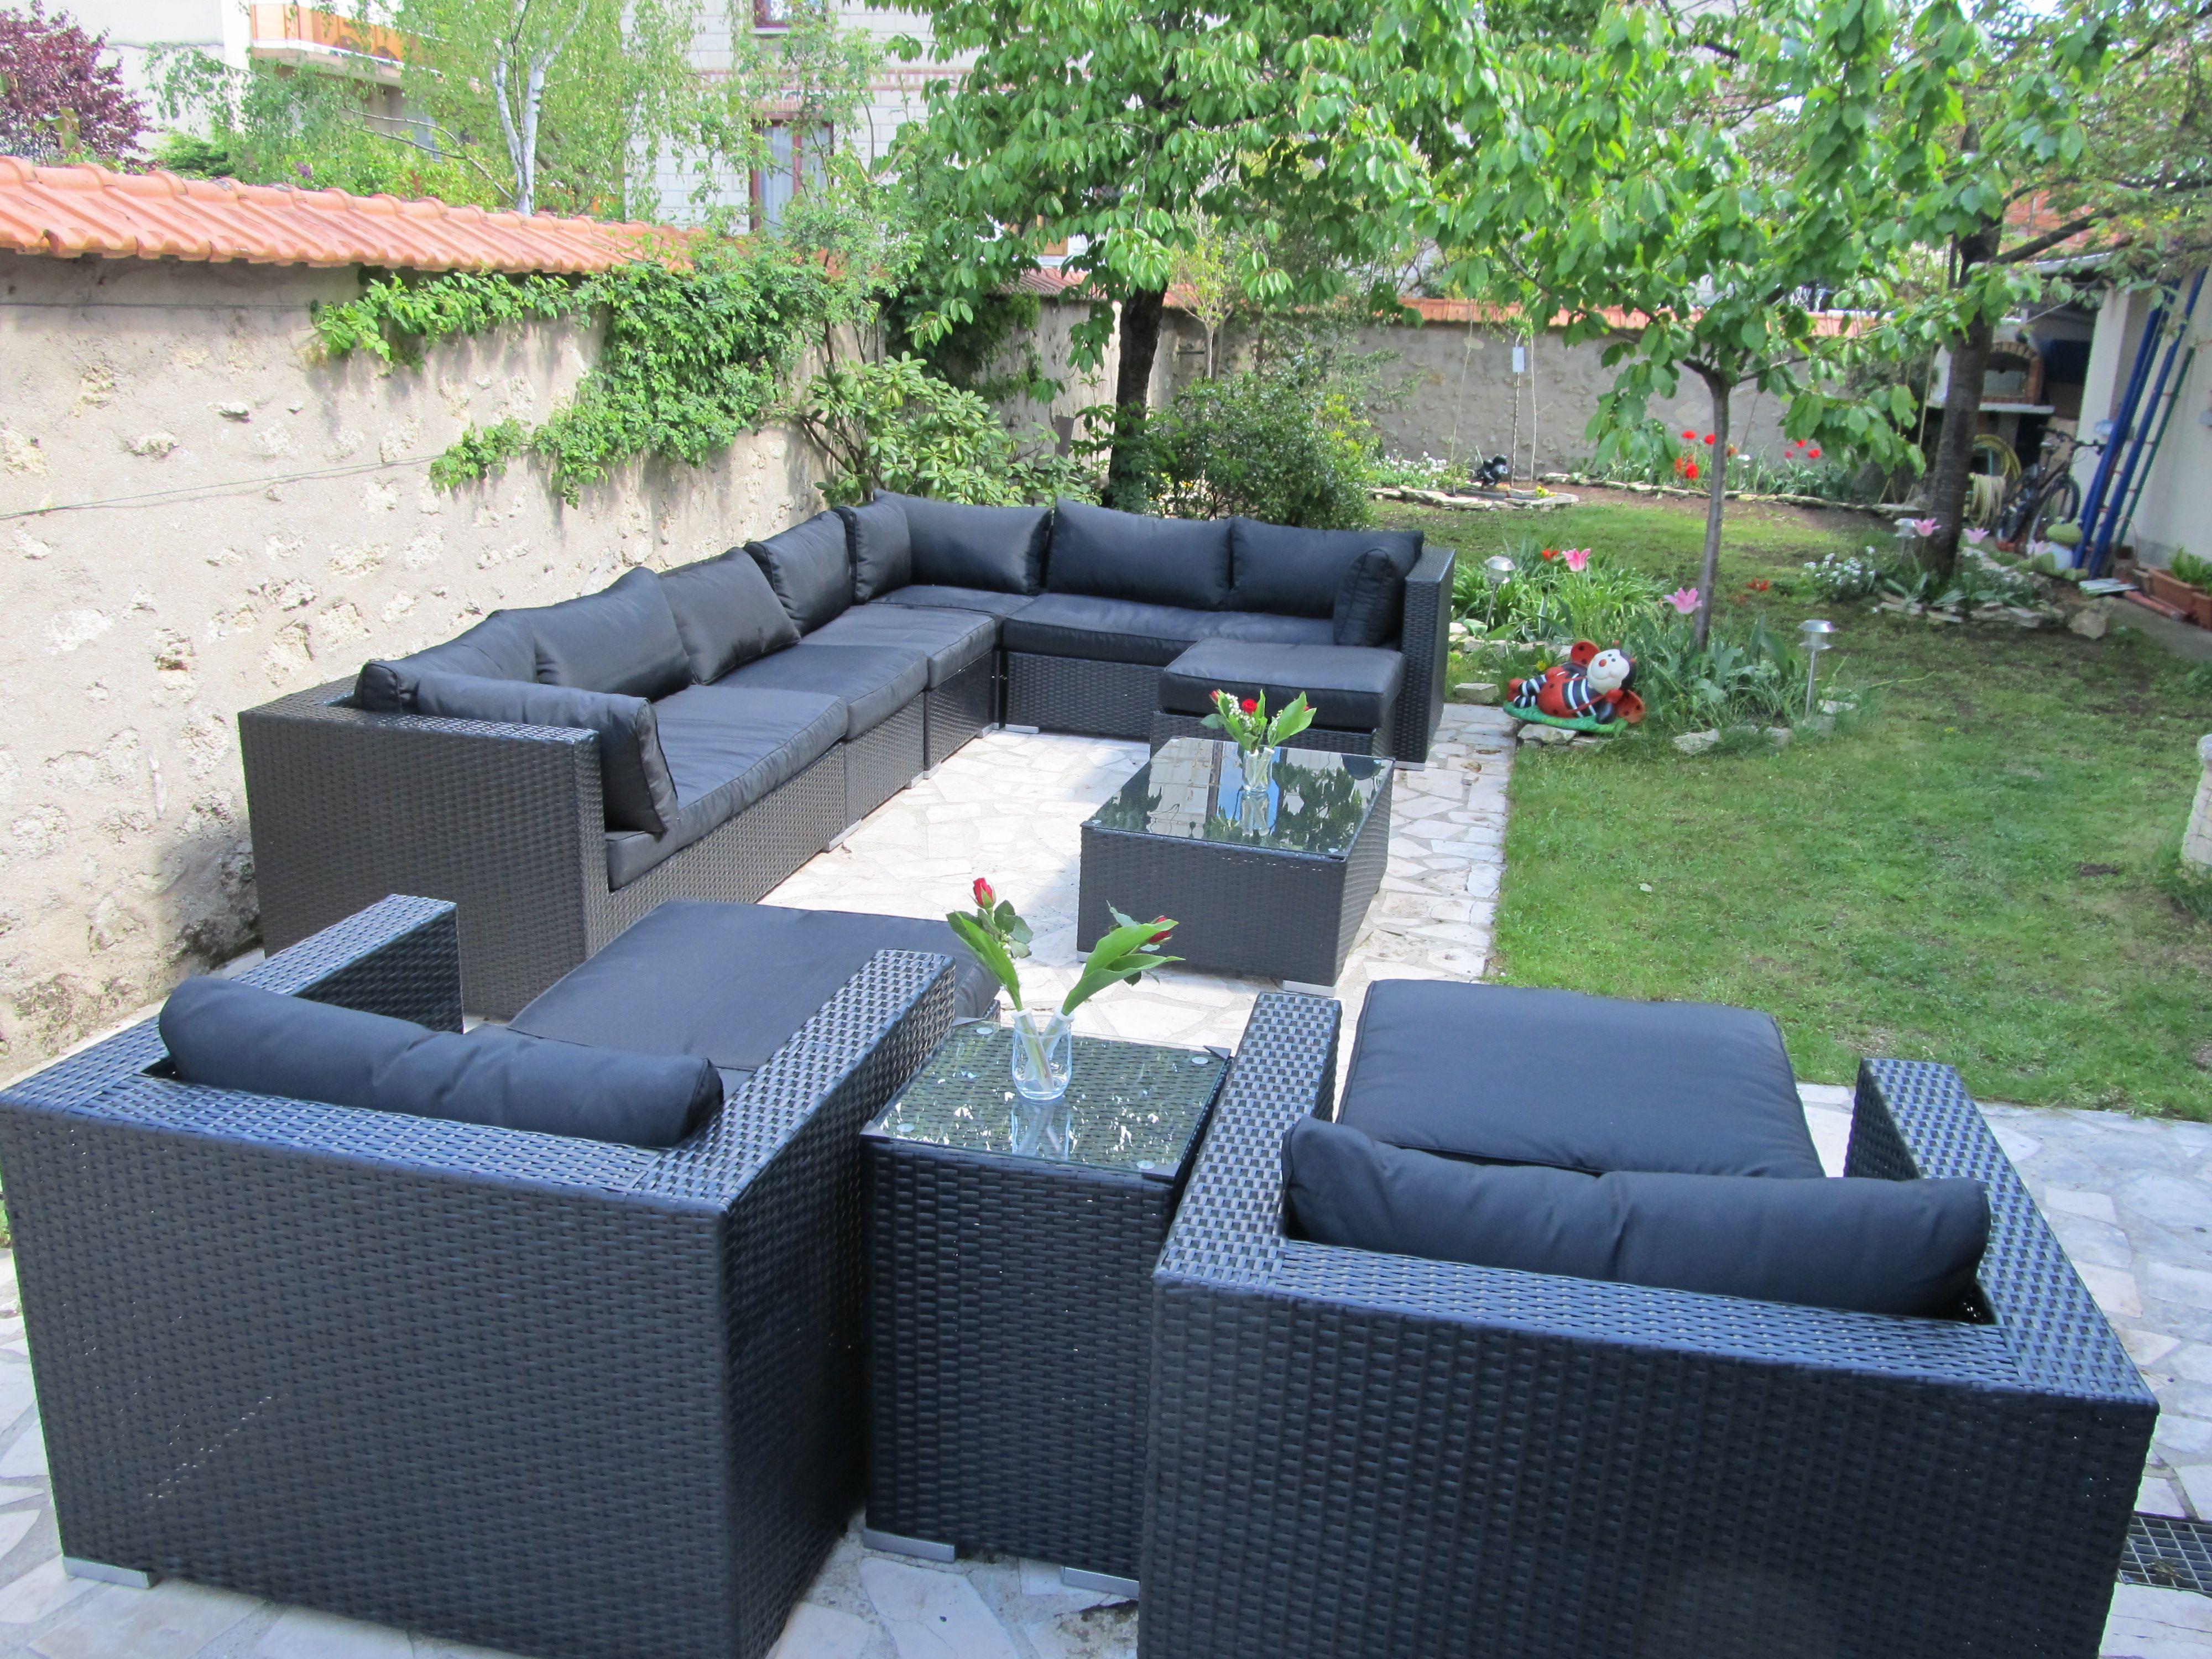 Salon de jardin 14 places en résine tressée canapé modulable Tripoli ...